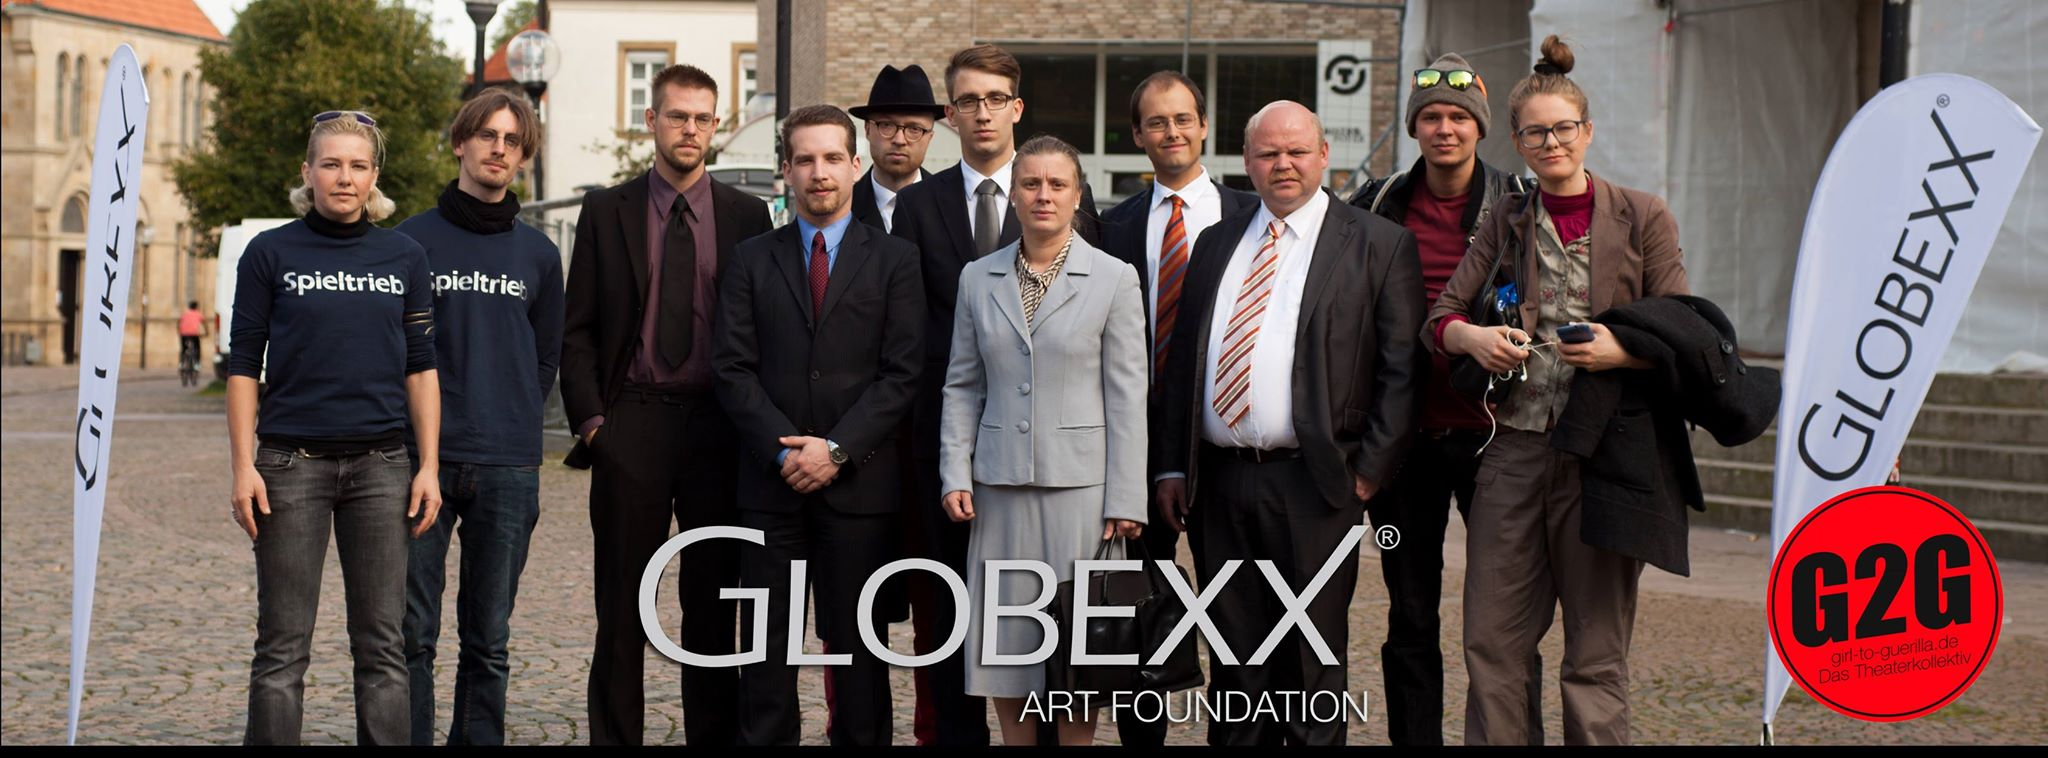 GlobexX Gruppenbild